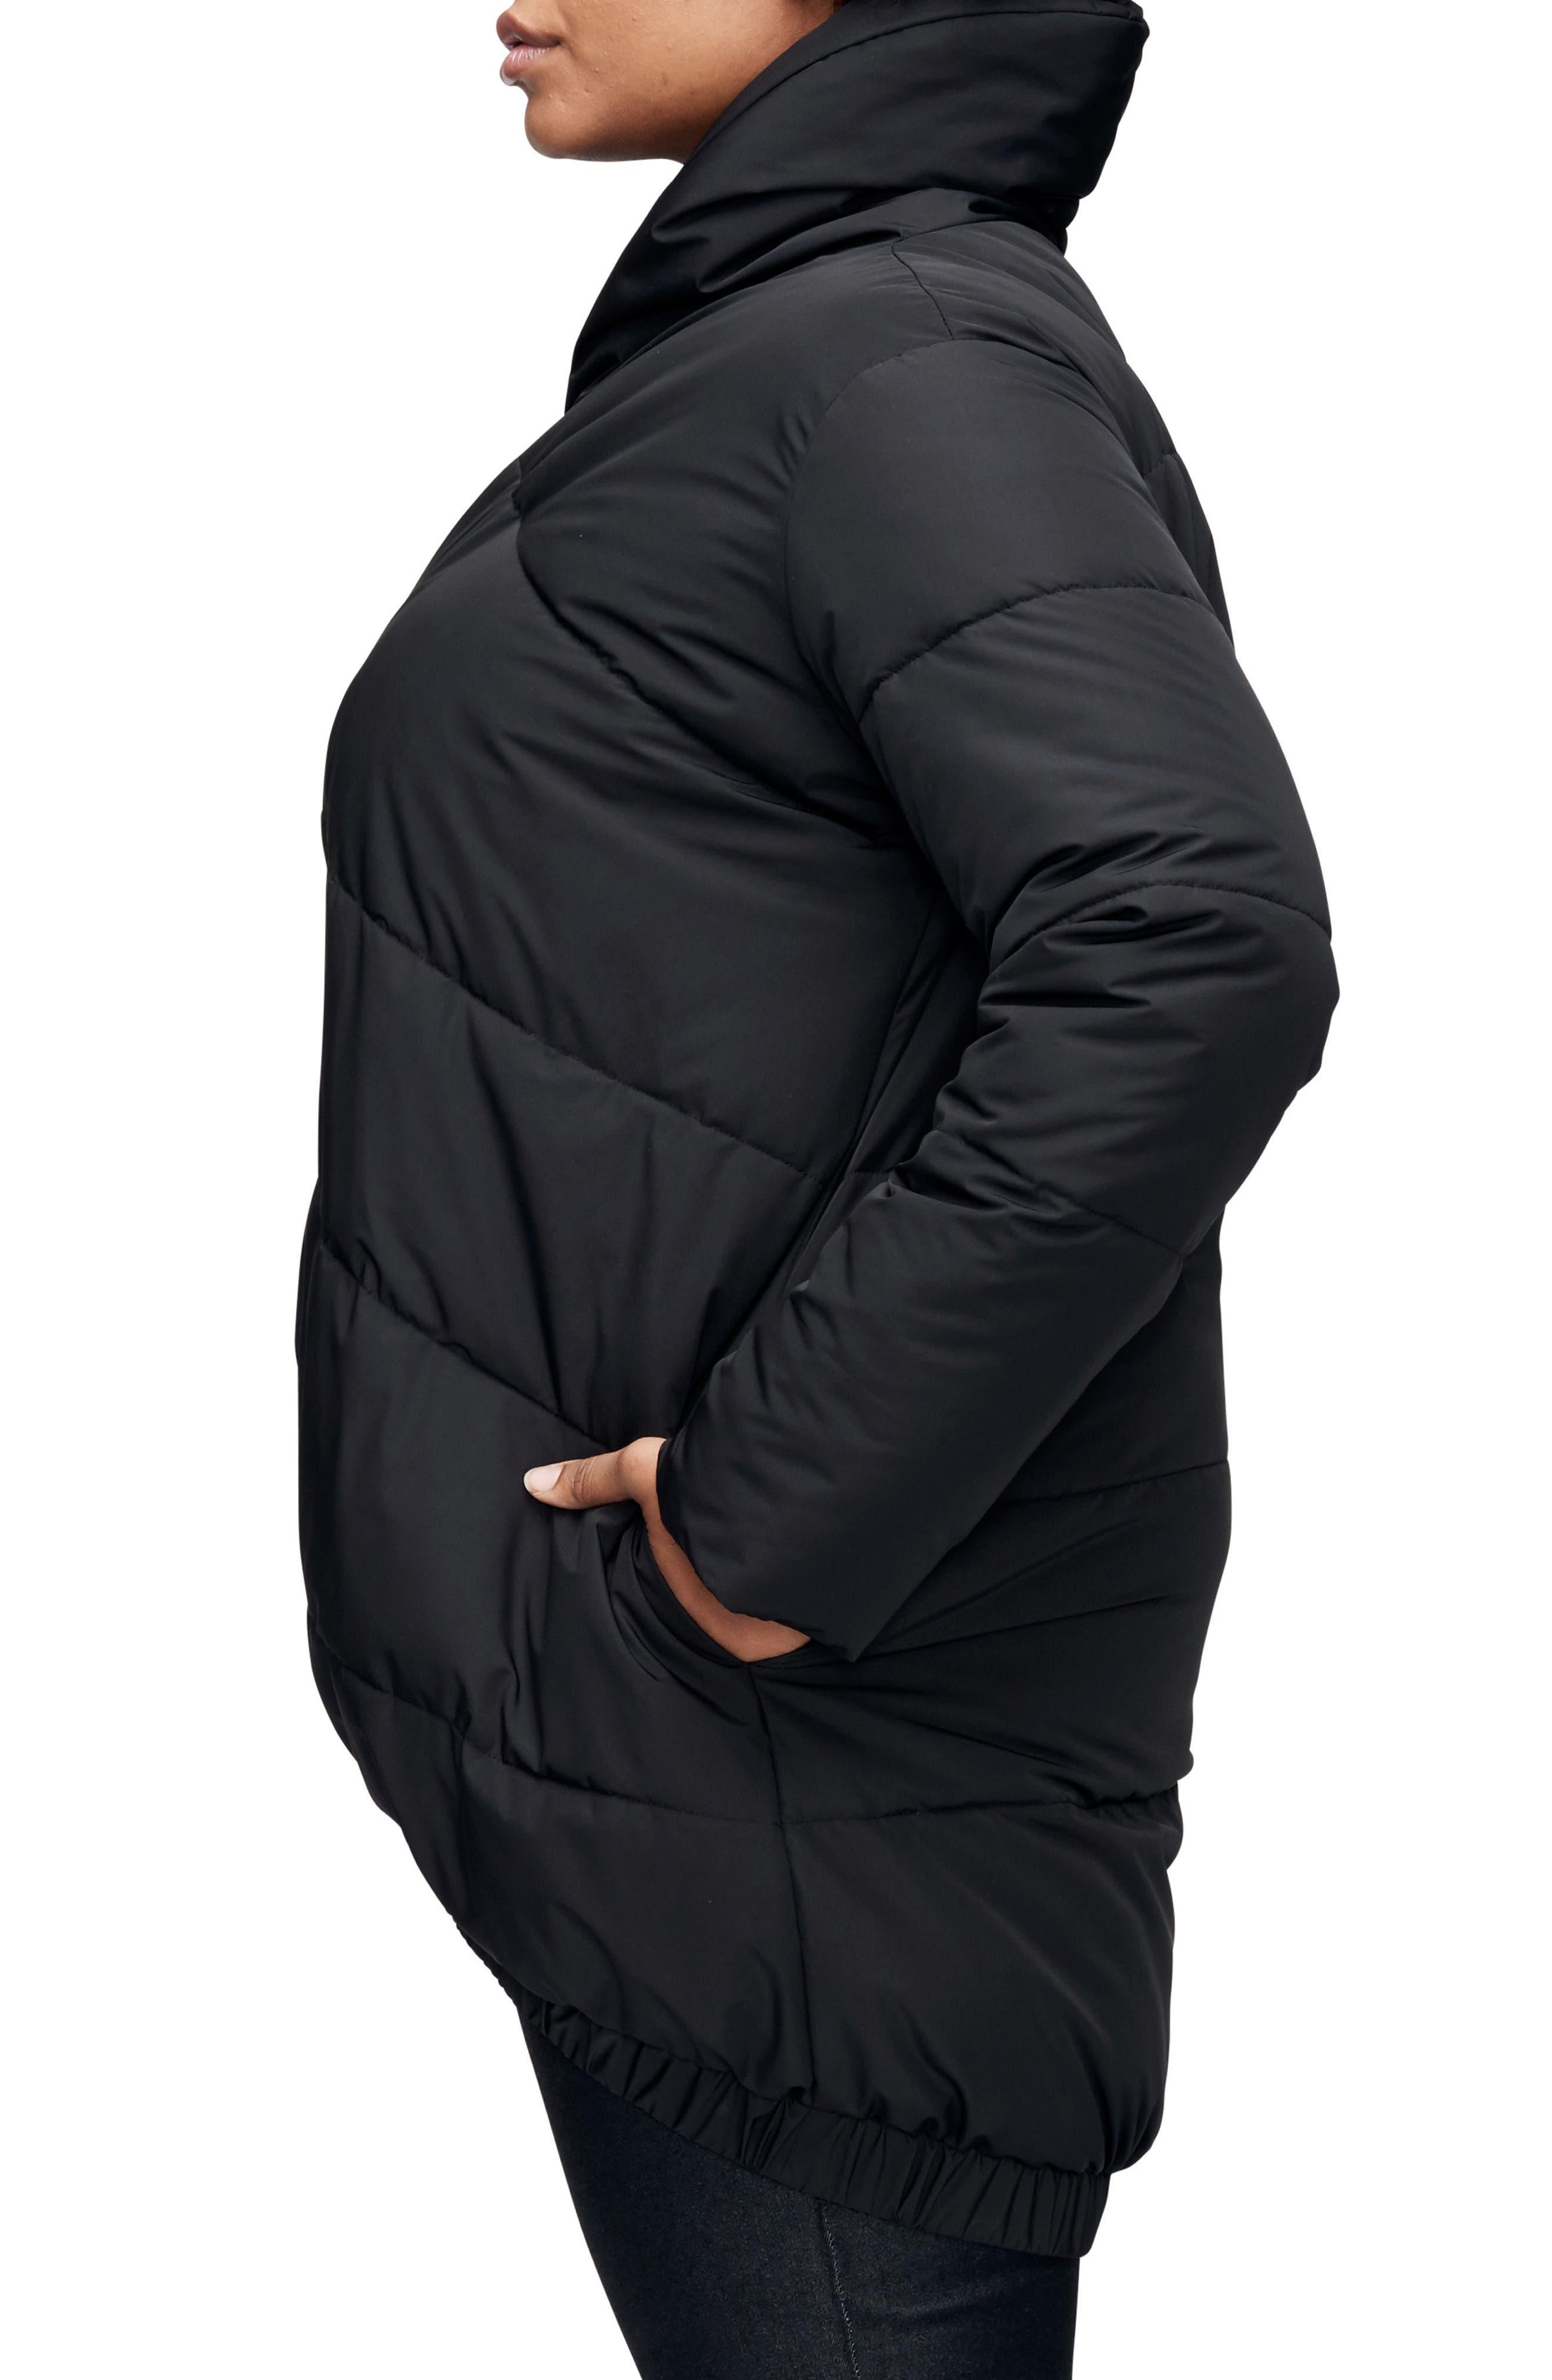 UNIVERSAL STANDARD, Kanda Puffer Coat, Alternate thumbnail 4, color, BLACK